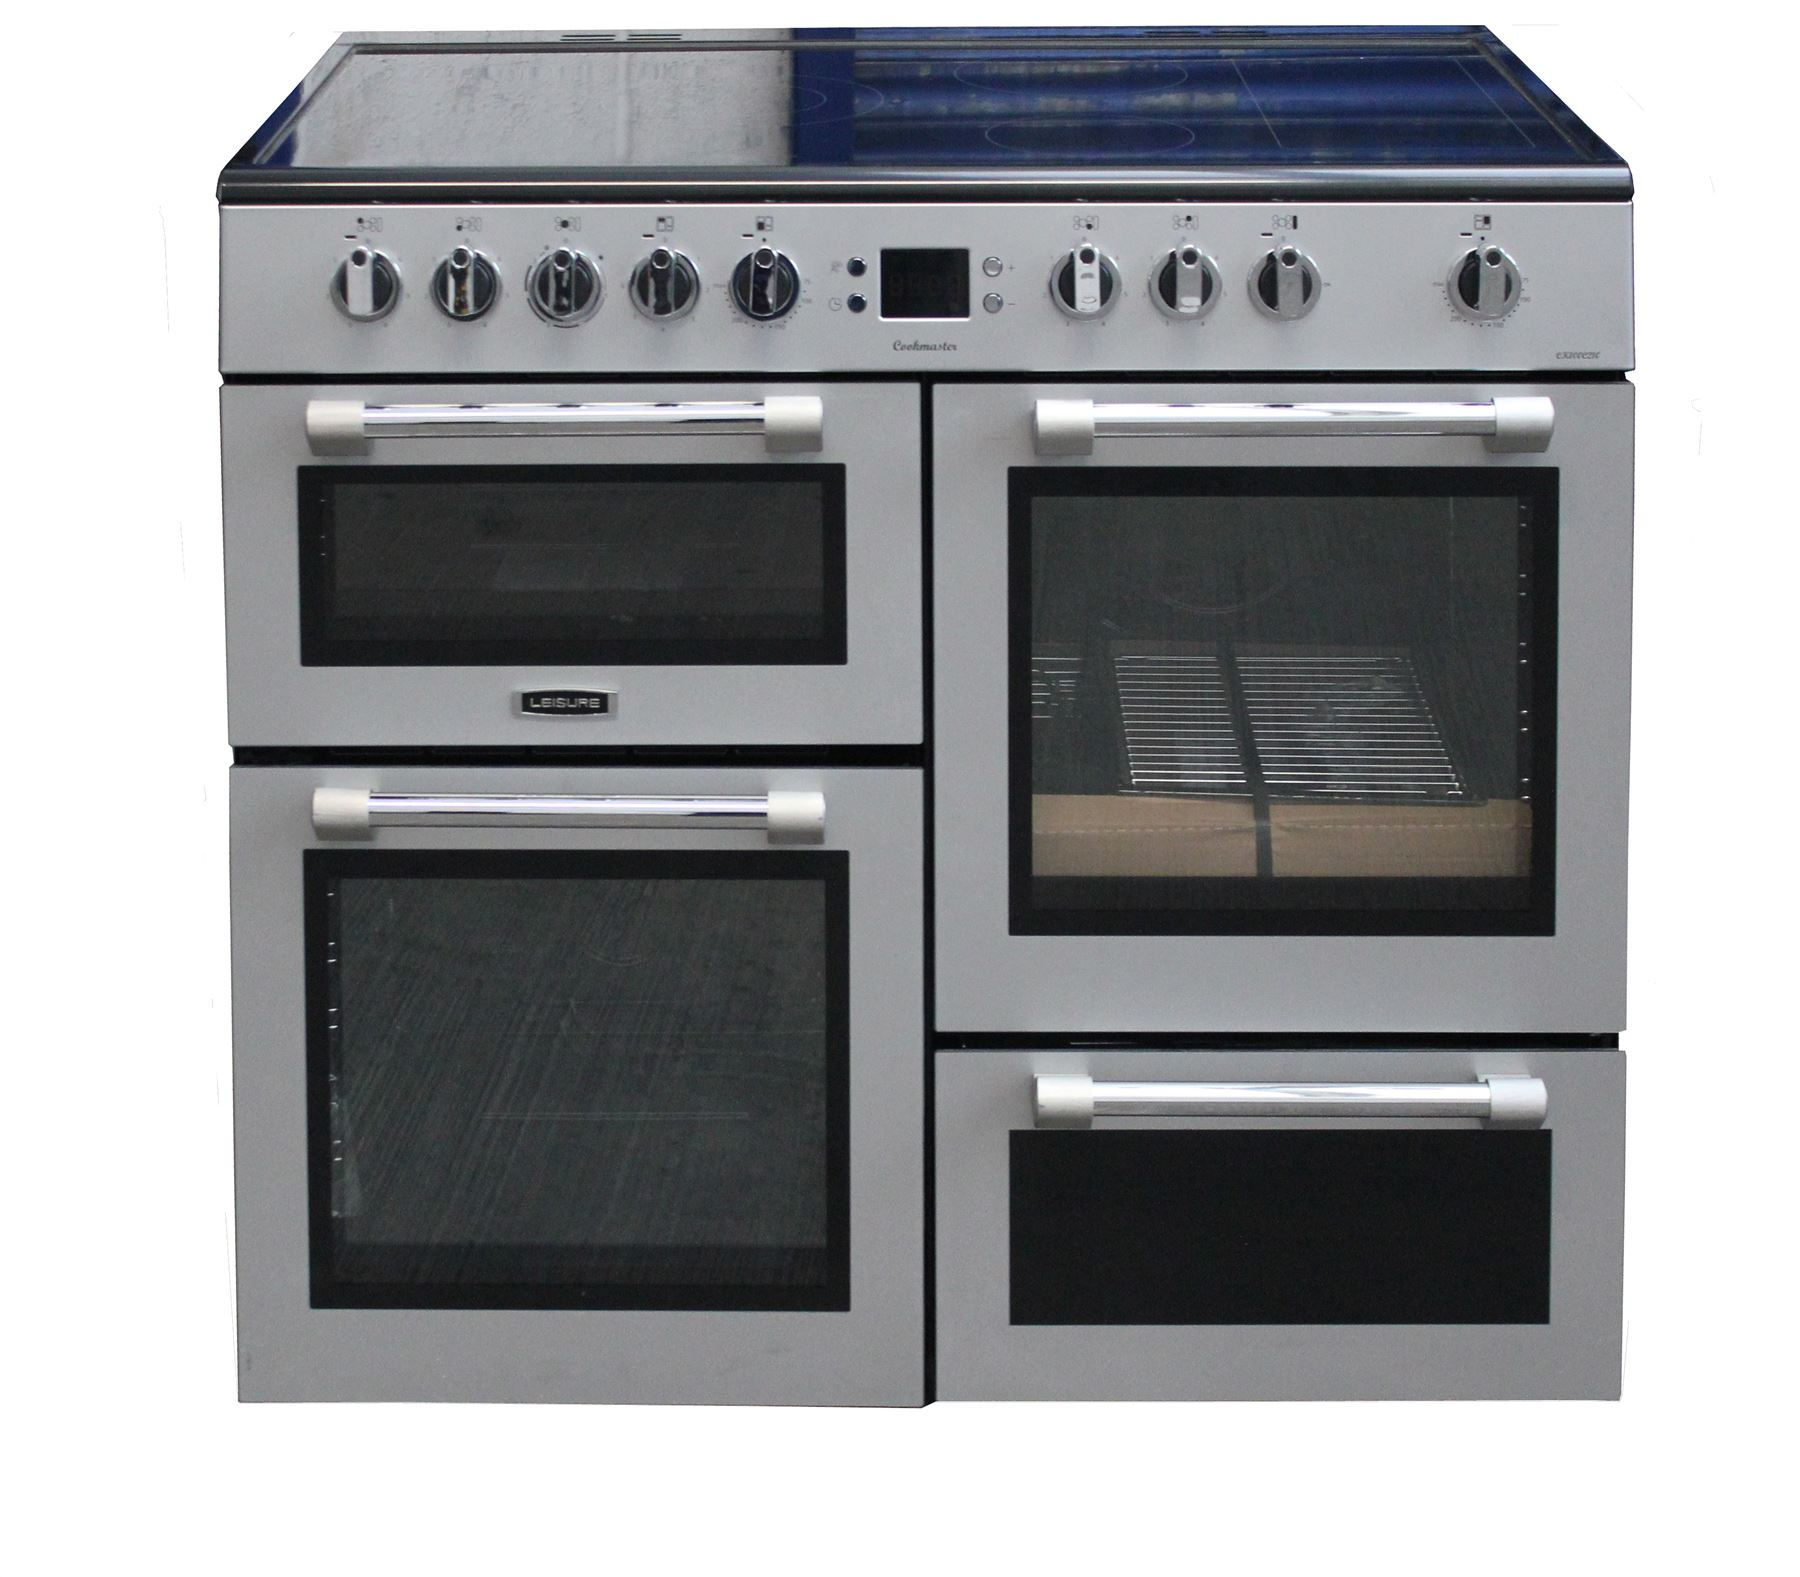 Leisure Cookmaster Ck100c210s 100cm Range Cooker Silver Ebay